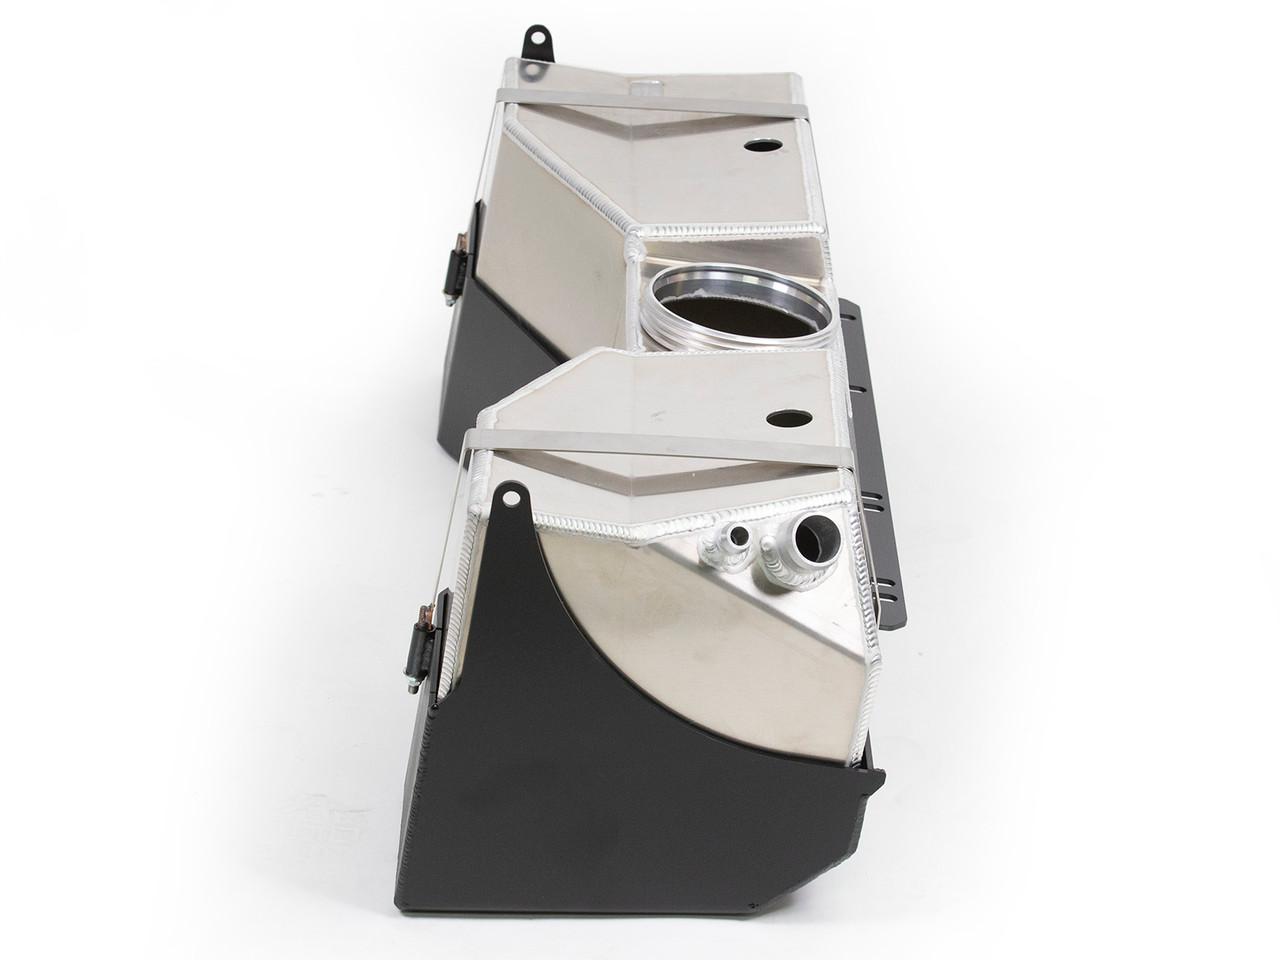 ALIEN Gas Tank & Skid Plate for Jeep TJ & LJ, 15 gallon